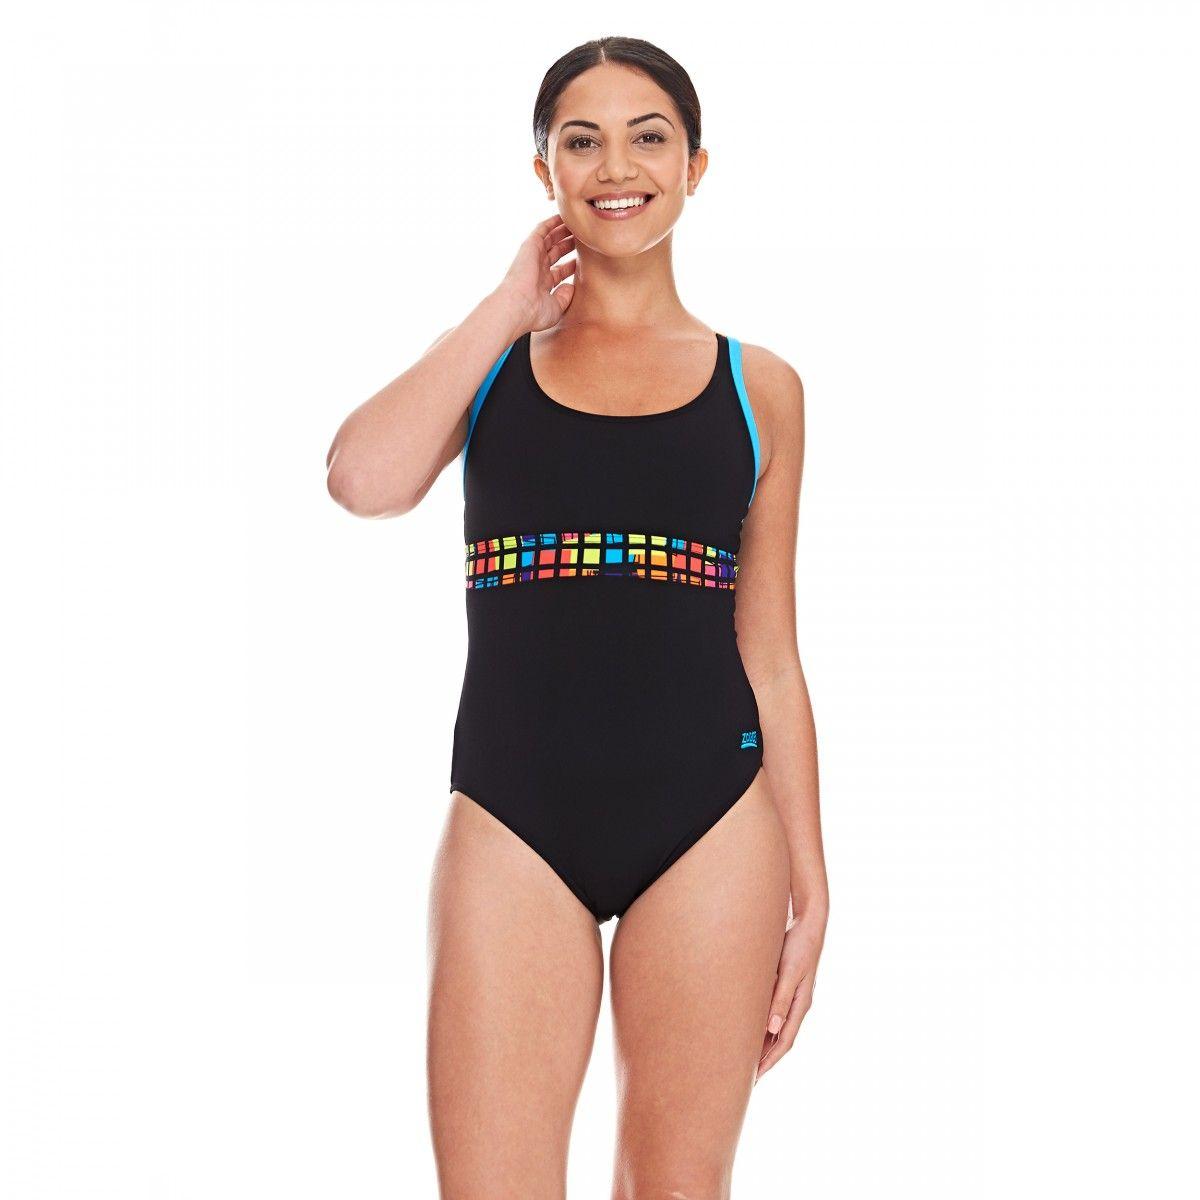 edfb4c84b1073 Zoggs Women's Quad Laserback Swimming Costume - Sizes 8-18 | Women's ...